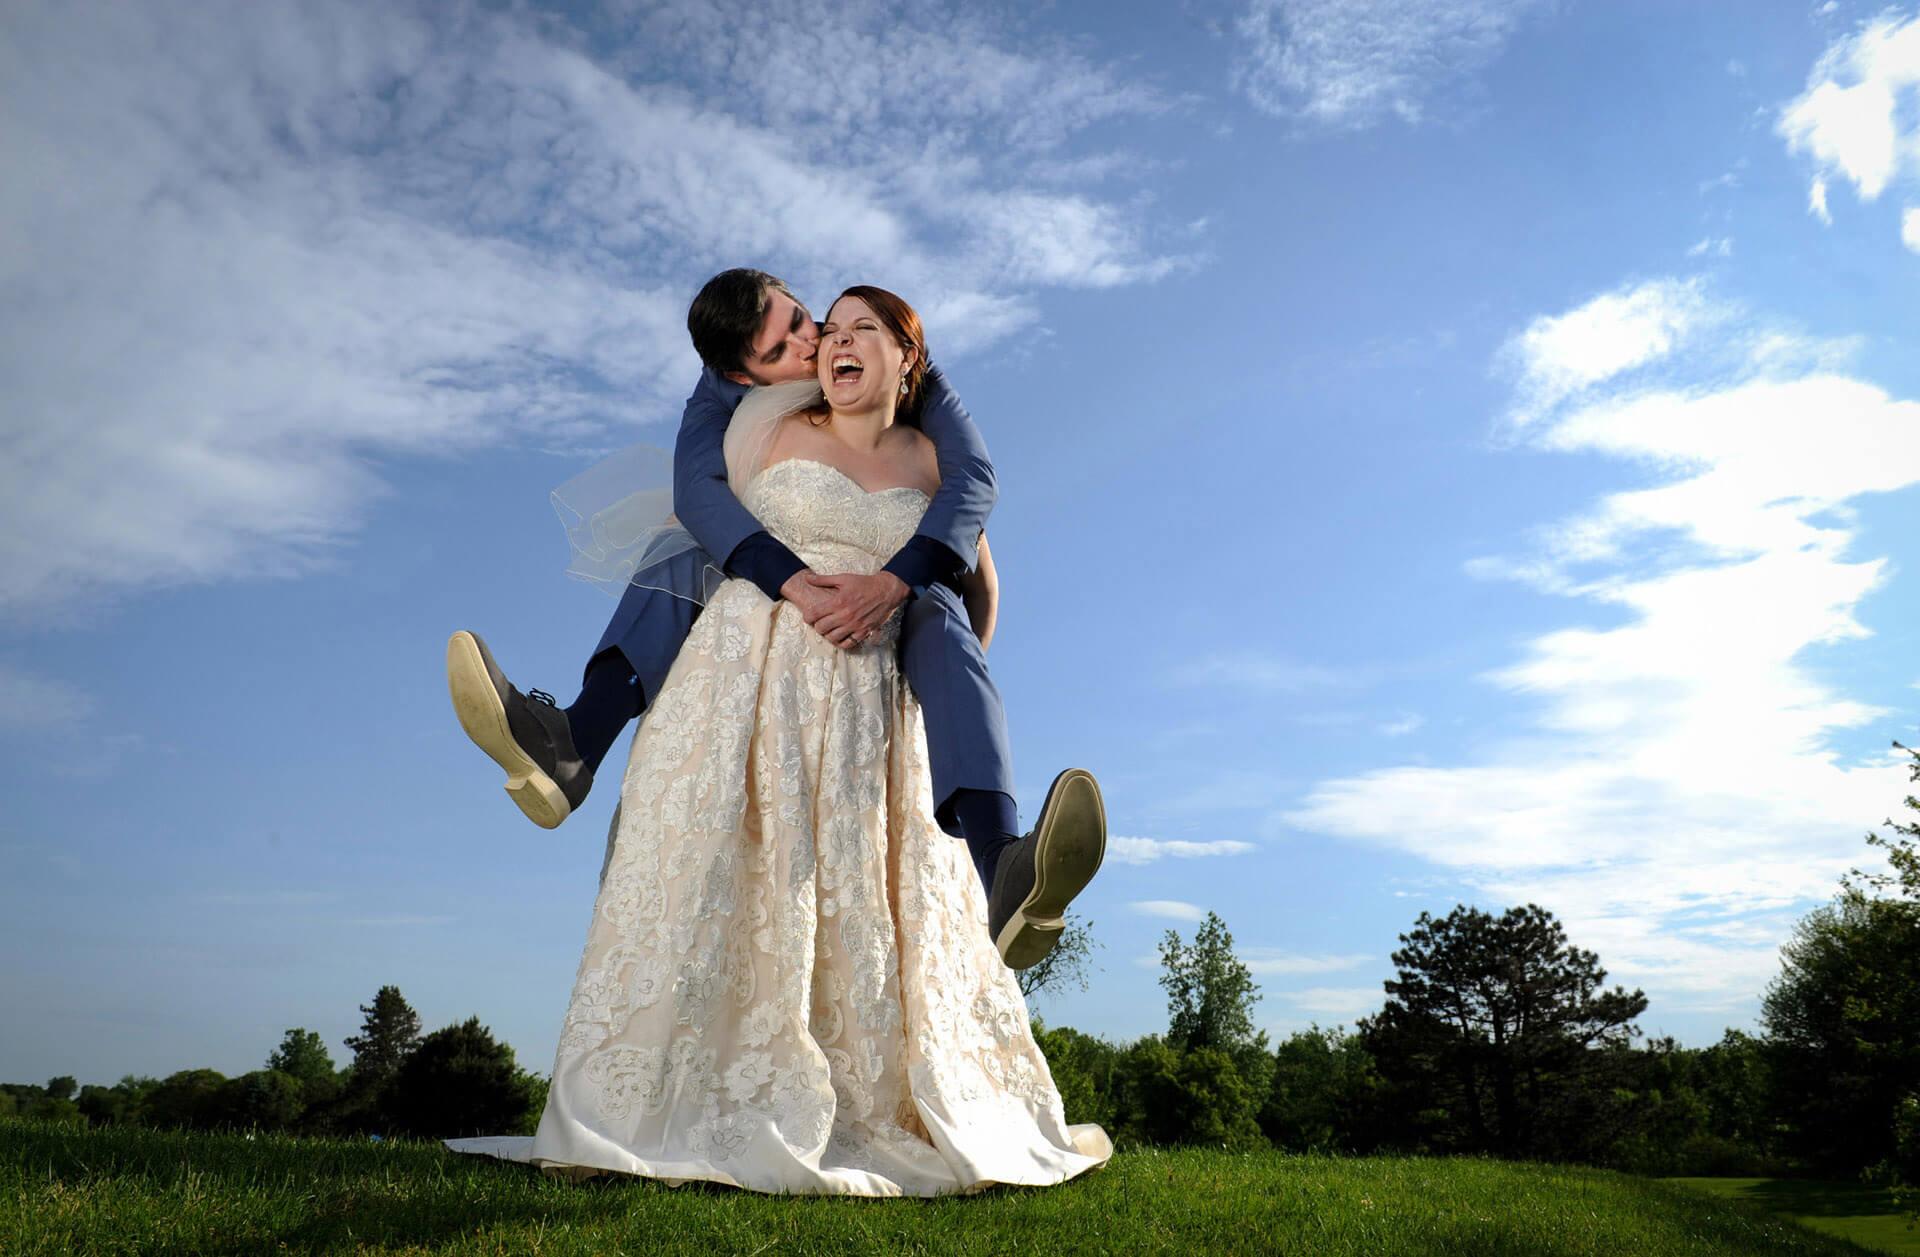 Fun, candid wedding photojournalism is what this award winning photojournalist brings to shooting Ann Arbor weddings like this White Oaks wedding.